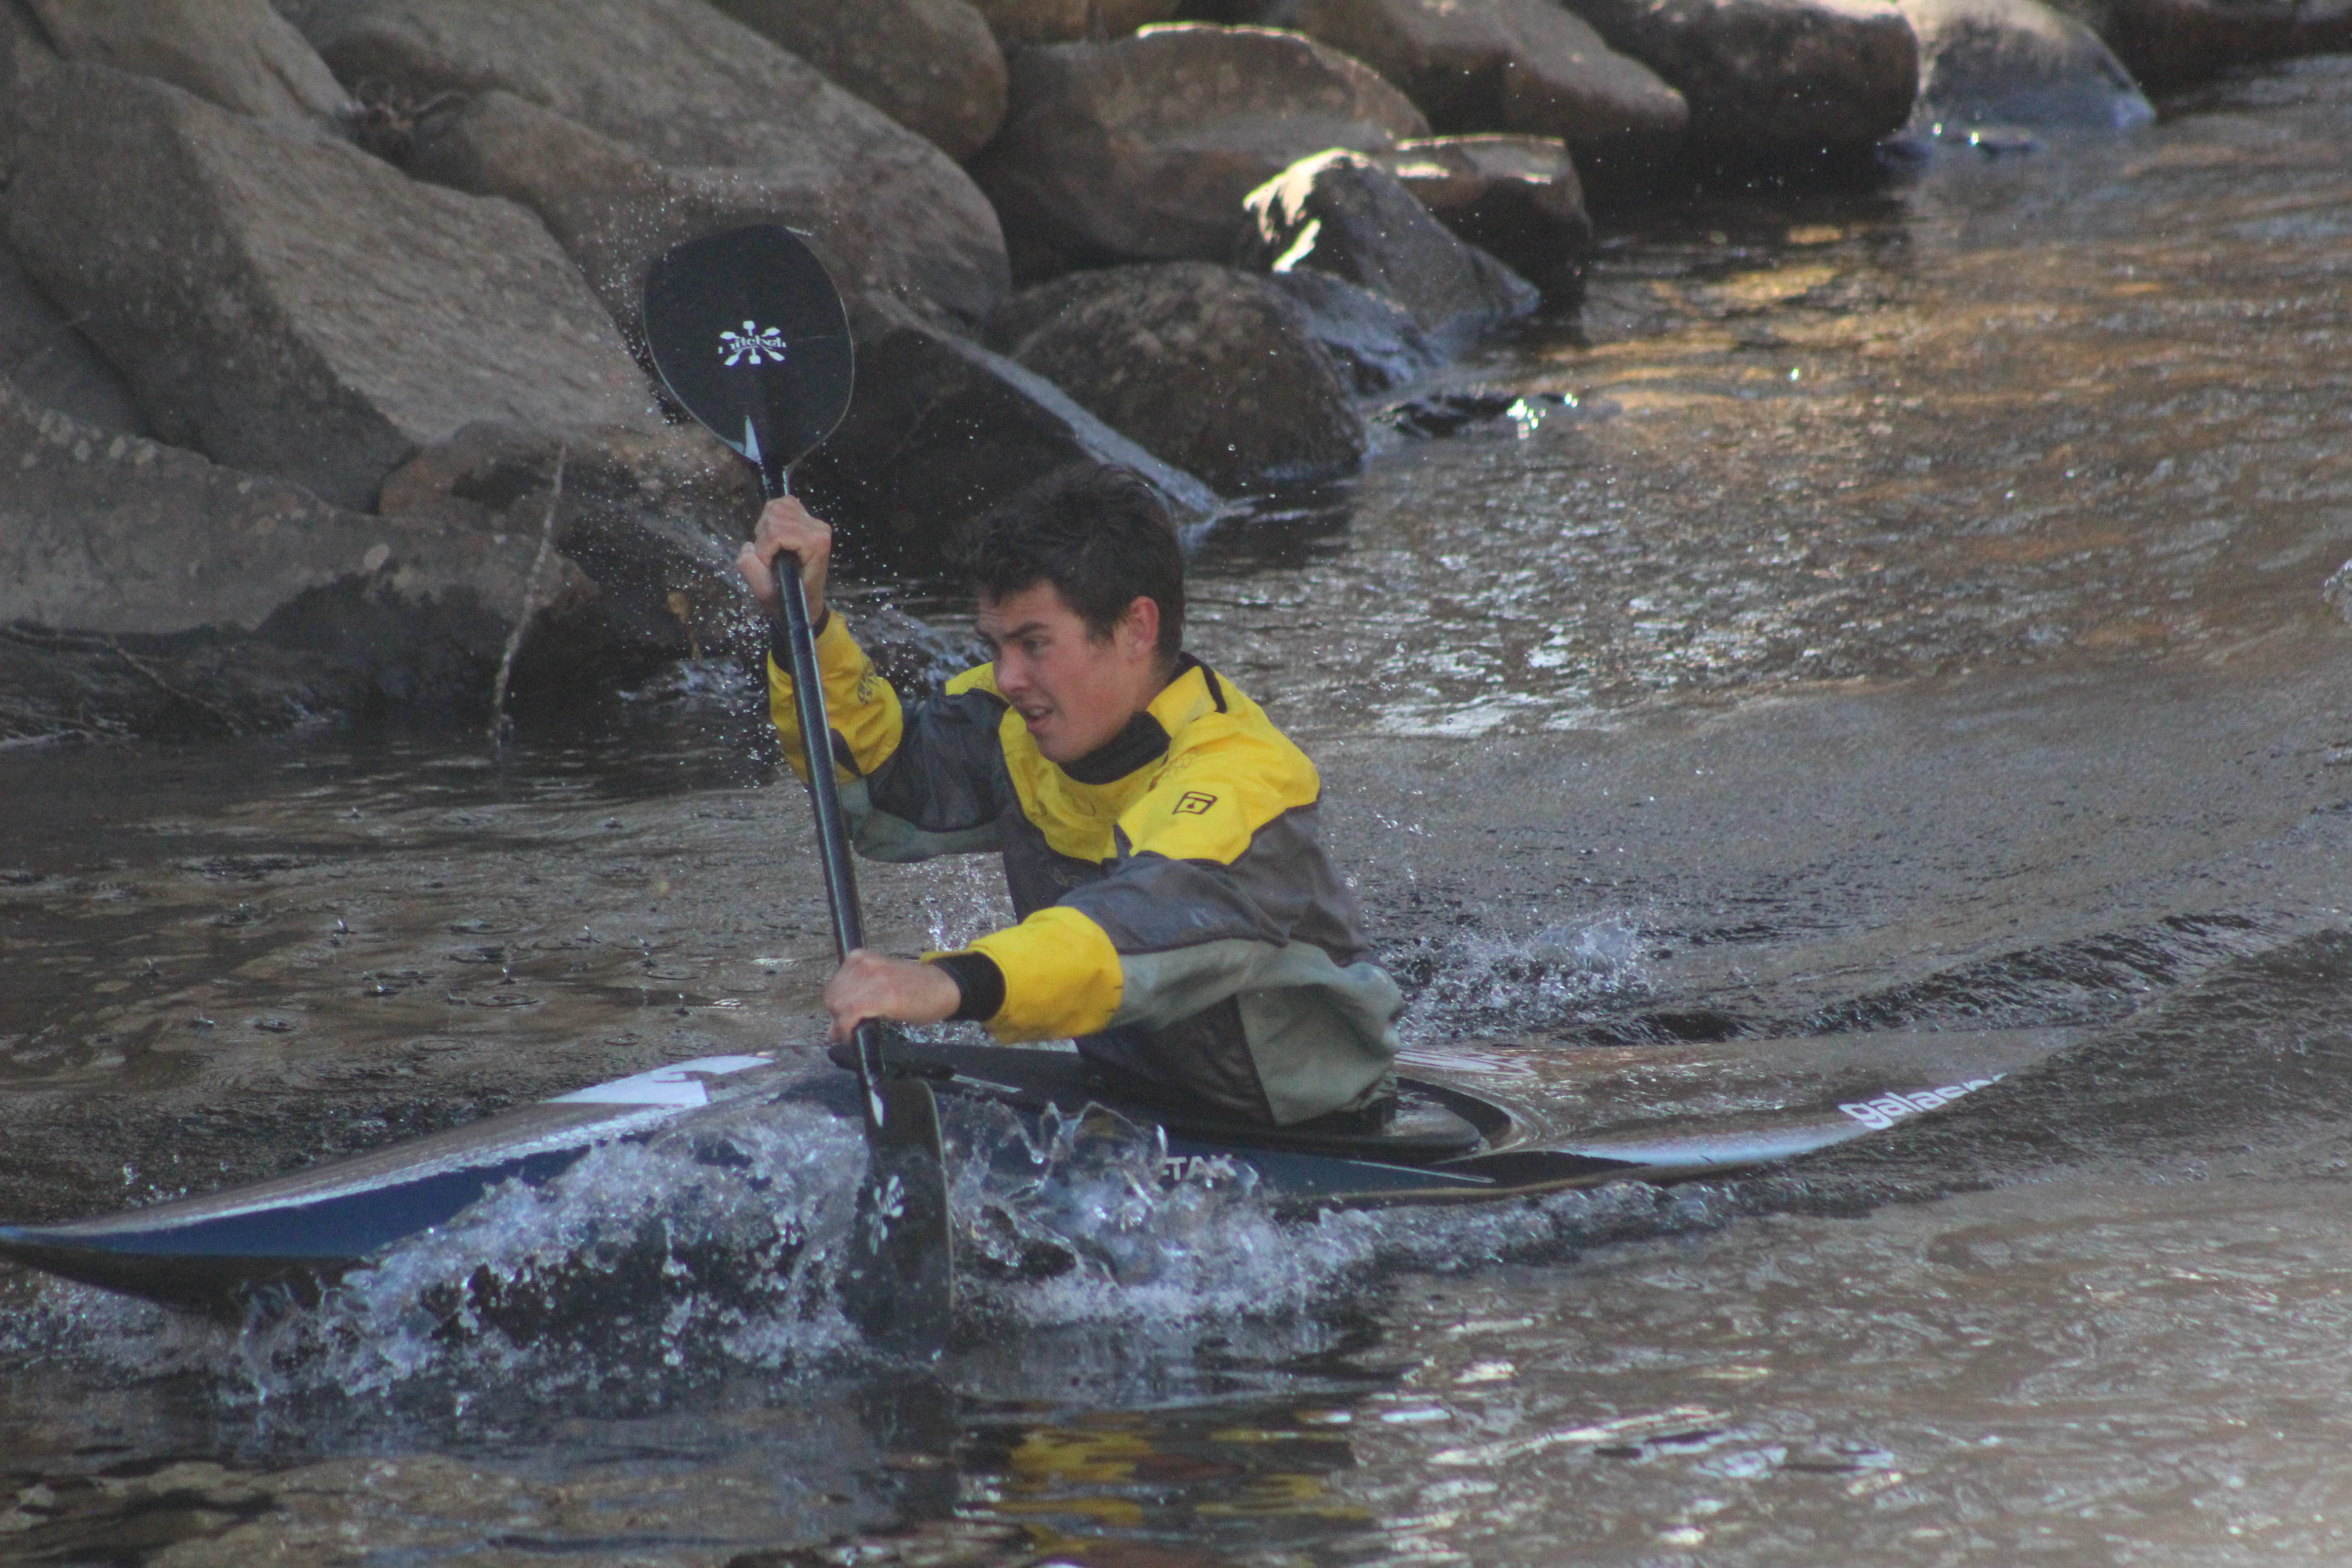 Proctor Academy kayaking